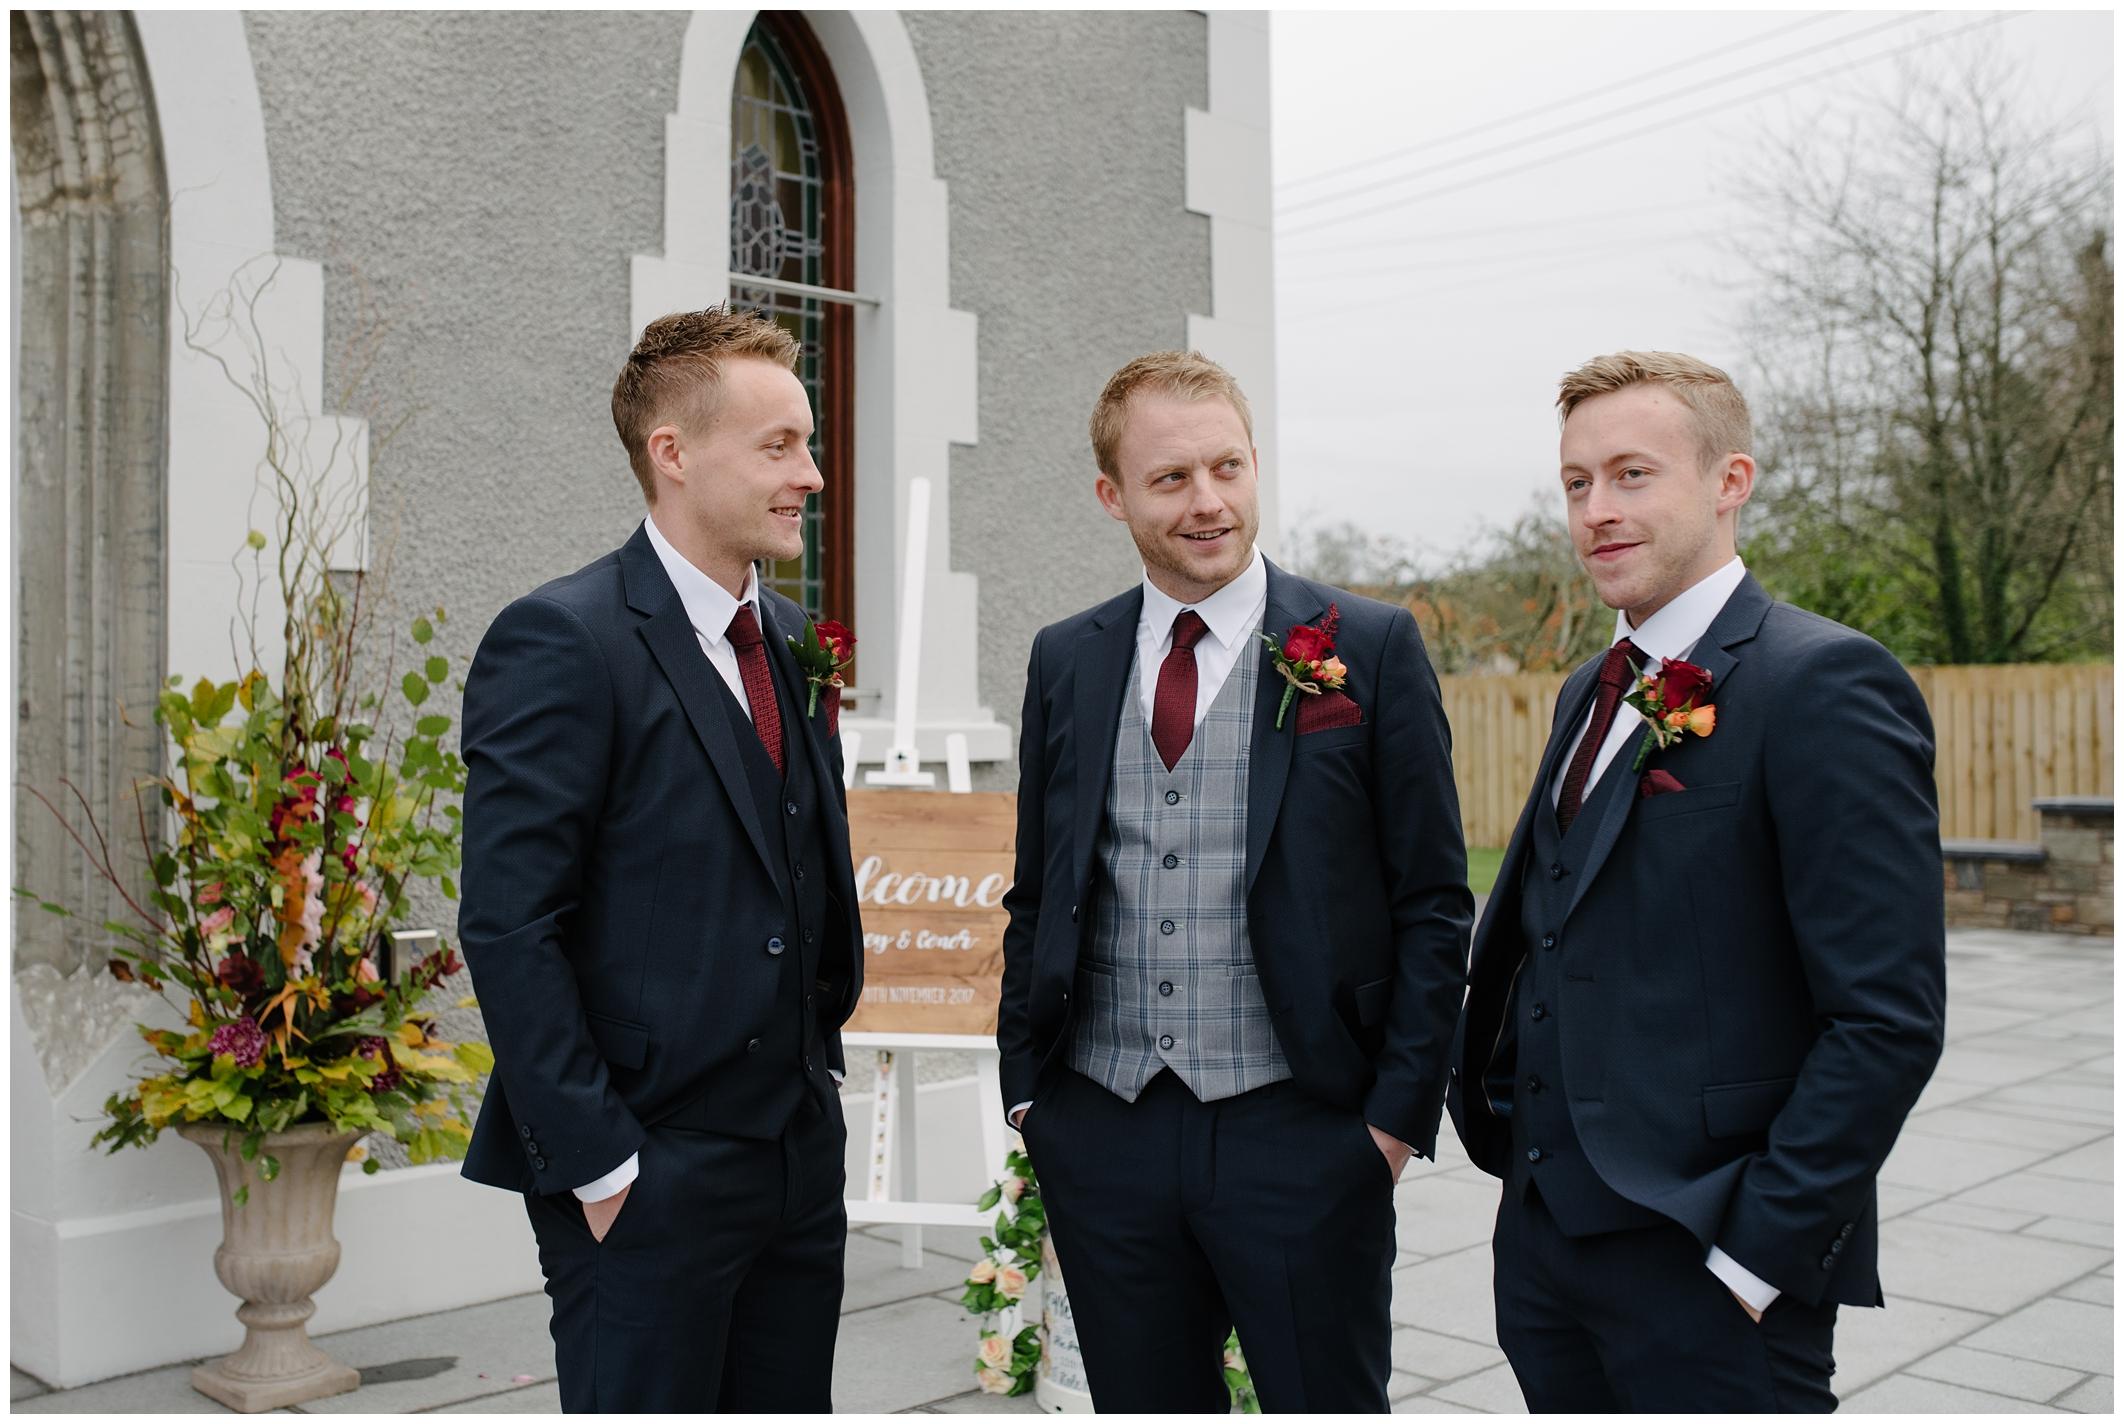 tracey_conor__wedding_jude_browne_photography_0014.jpg